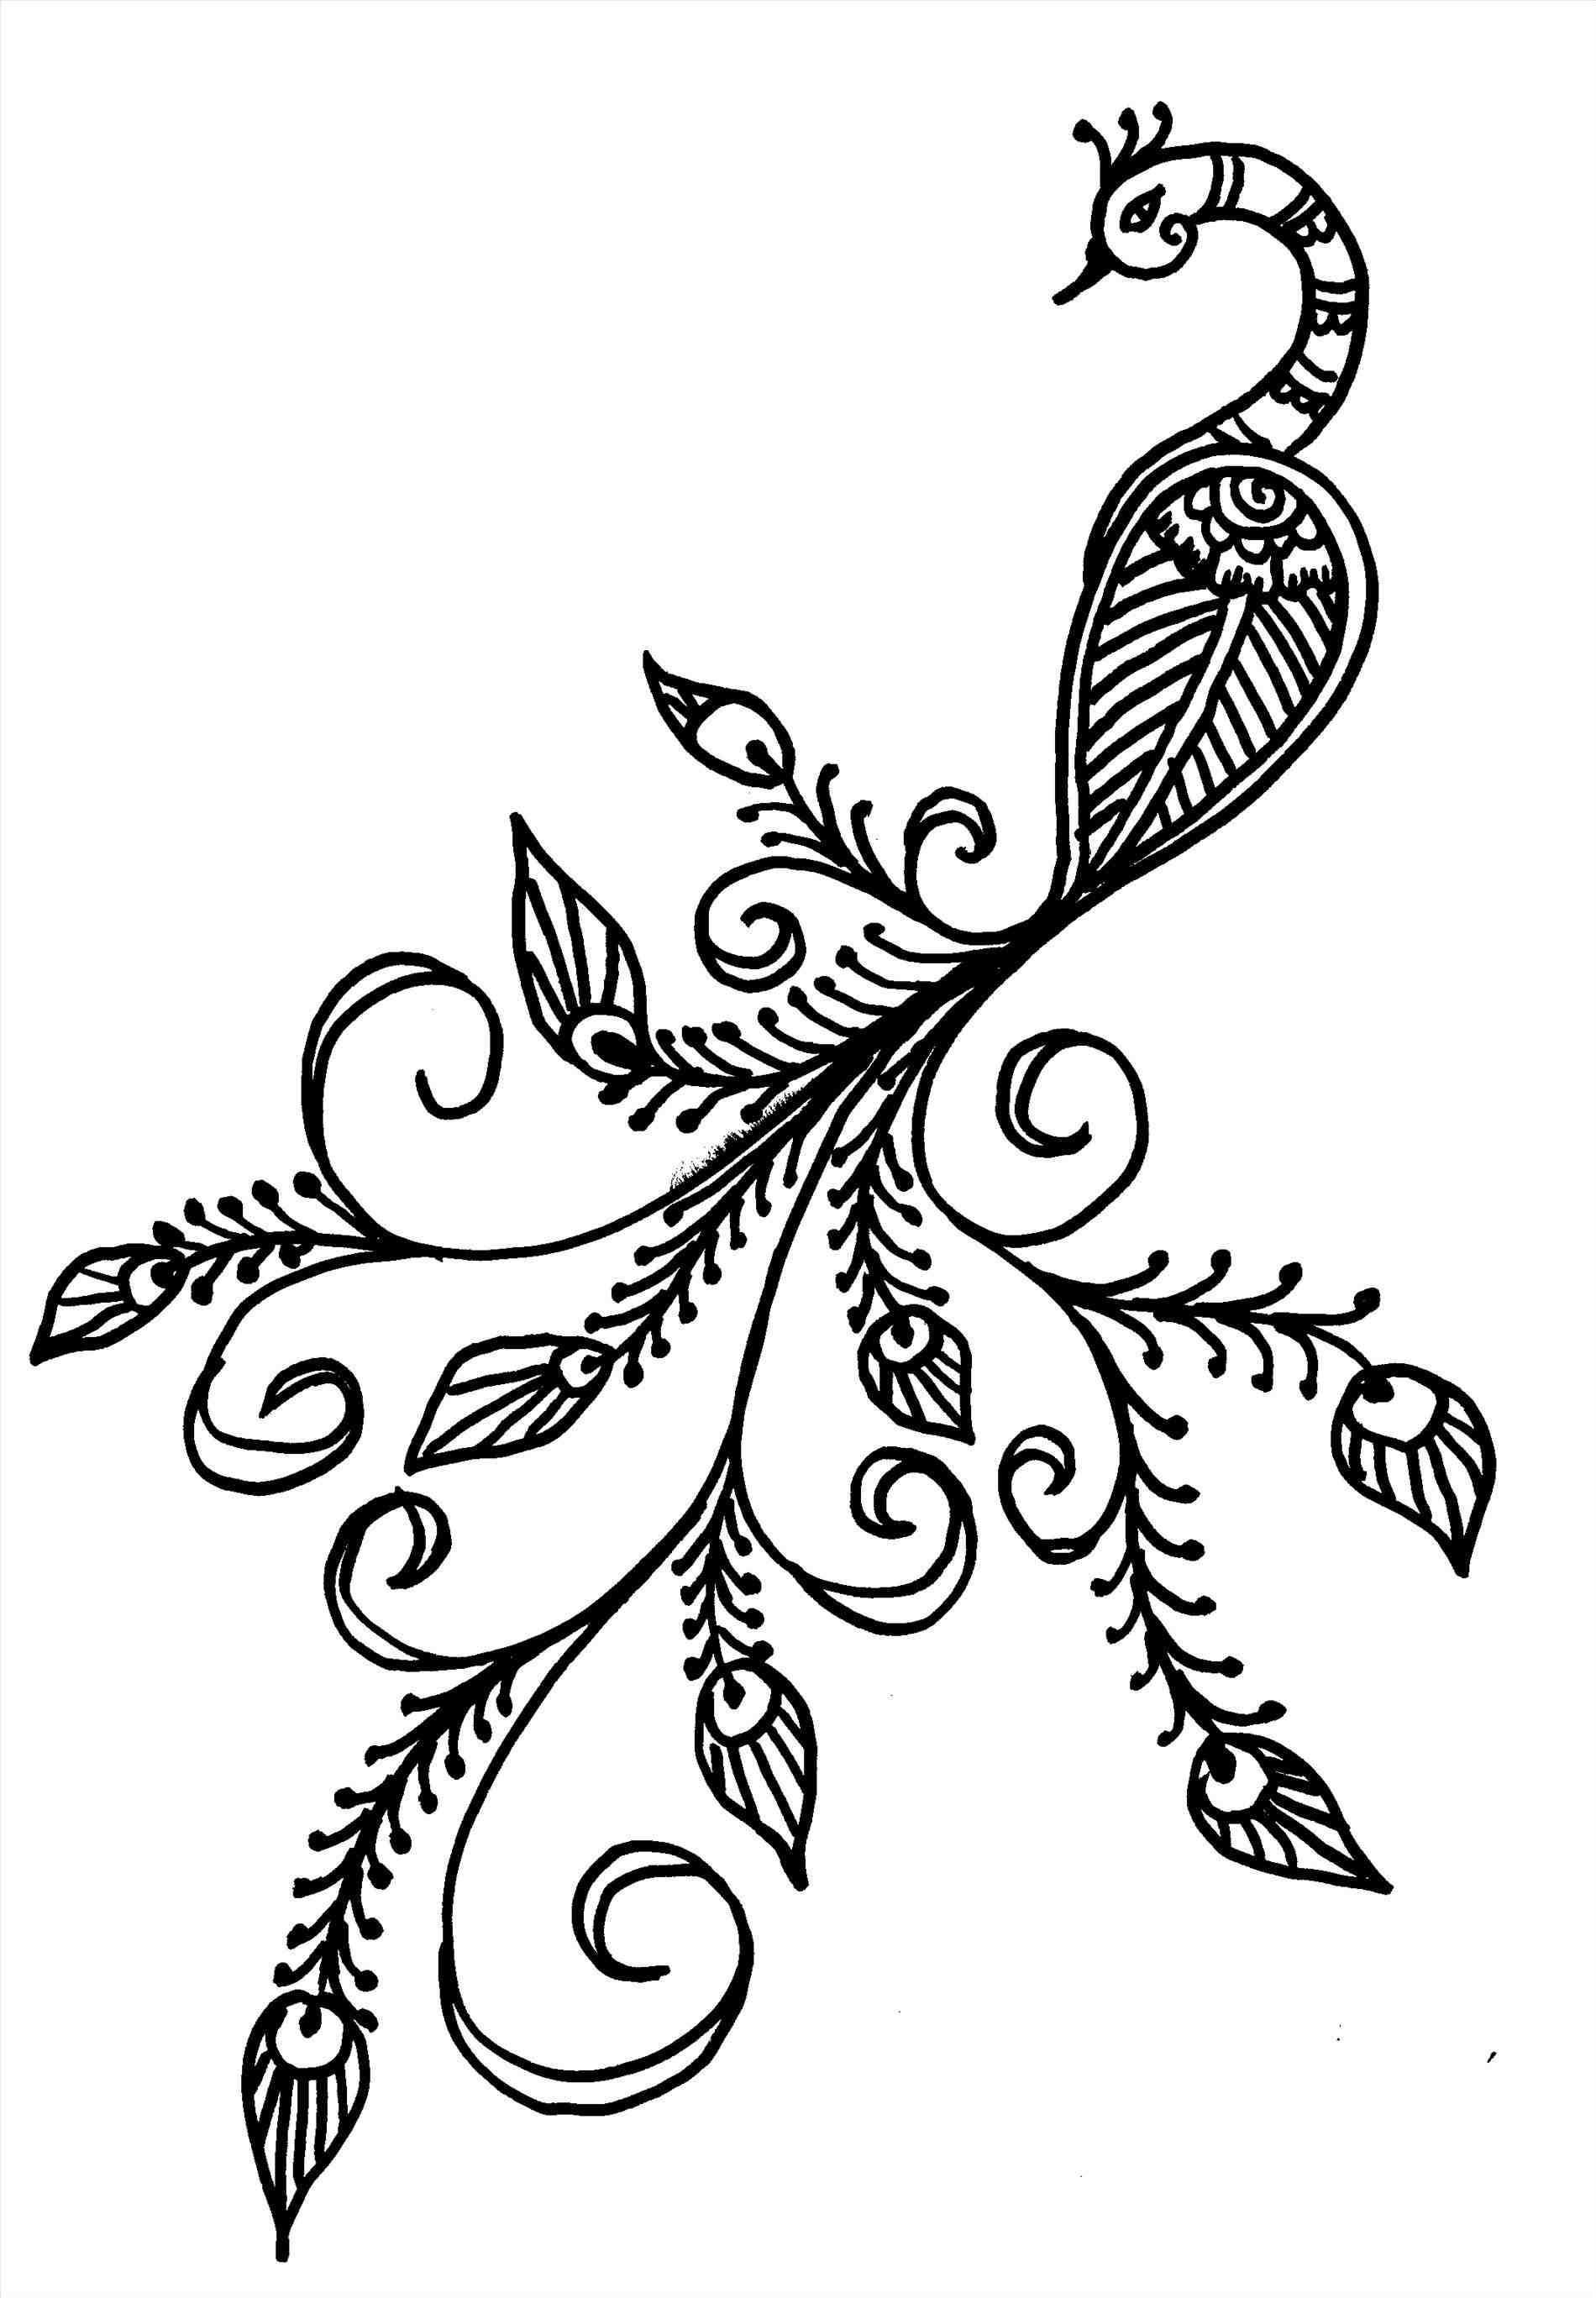 Printable Henna Tattoo Designs: Henna Design Drawing At GetDrawings